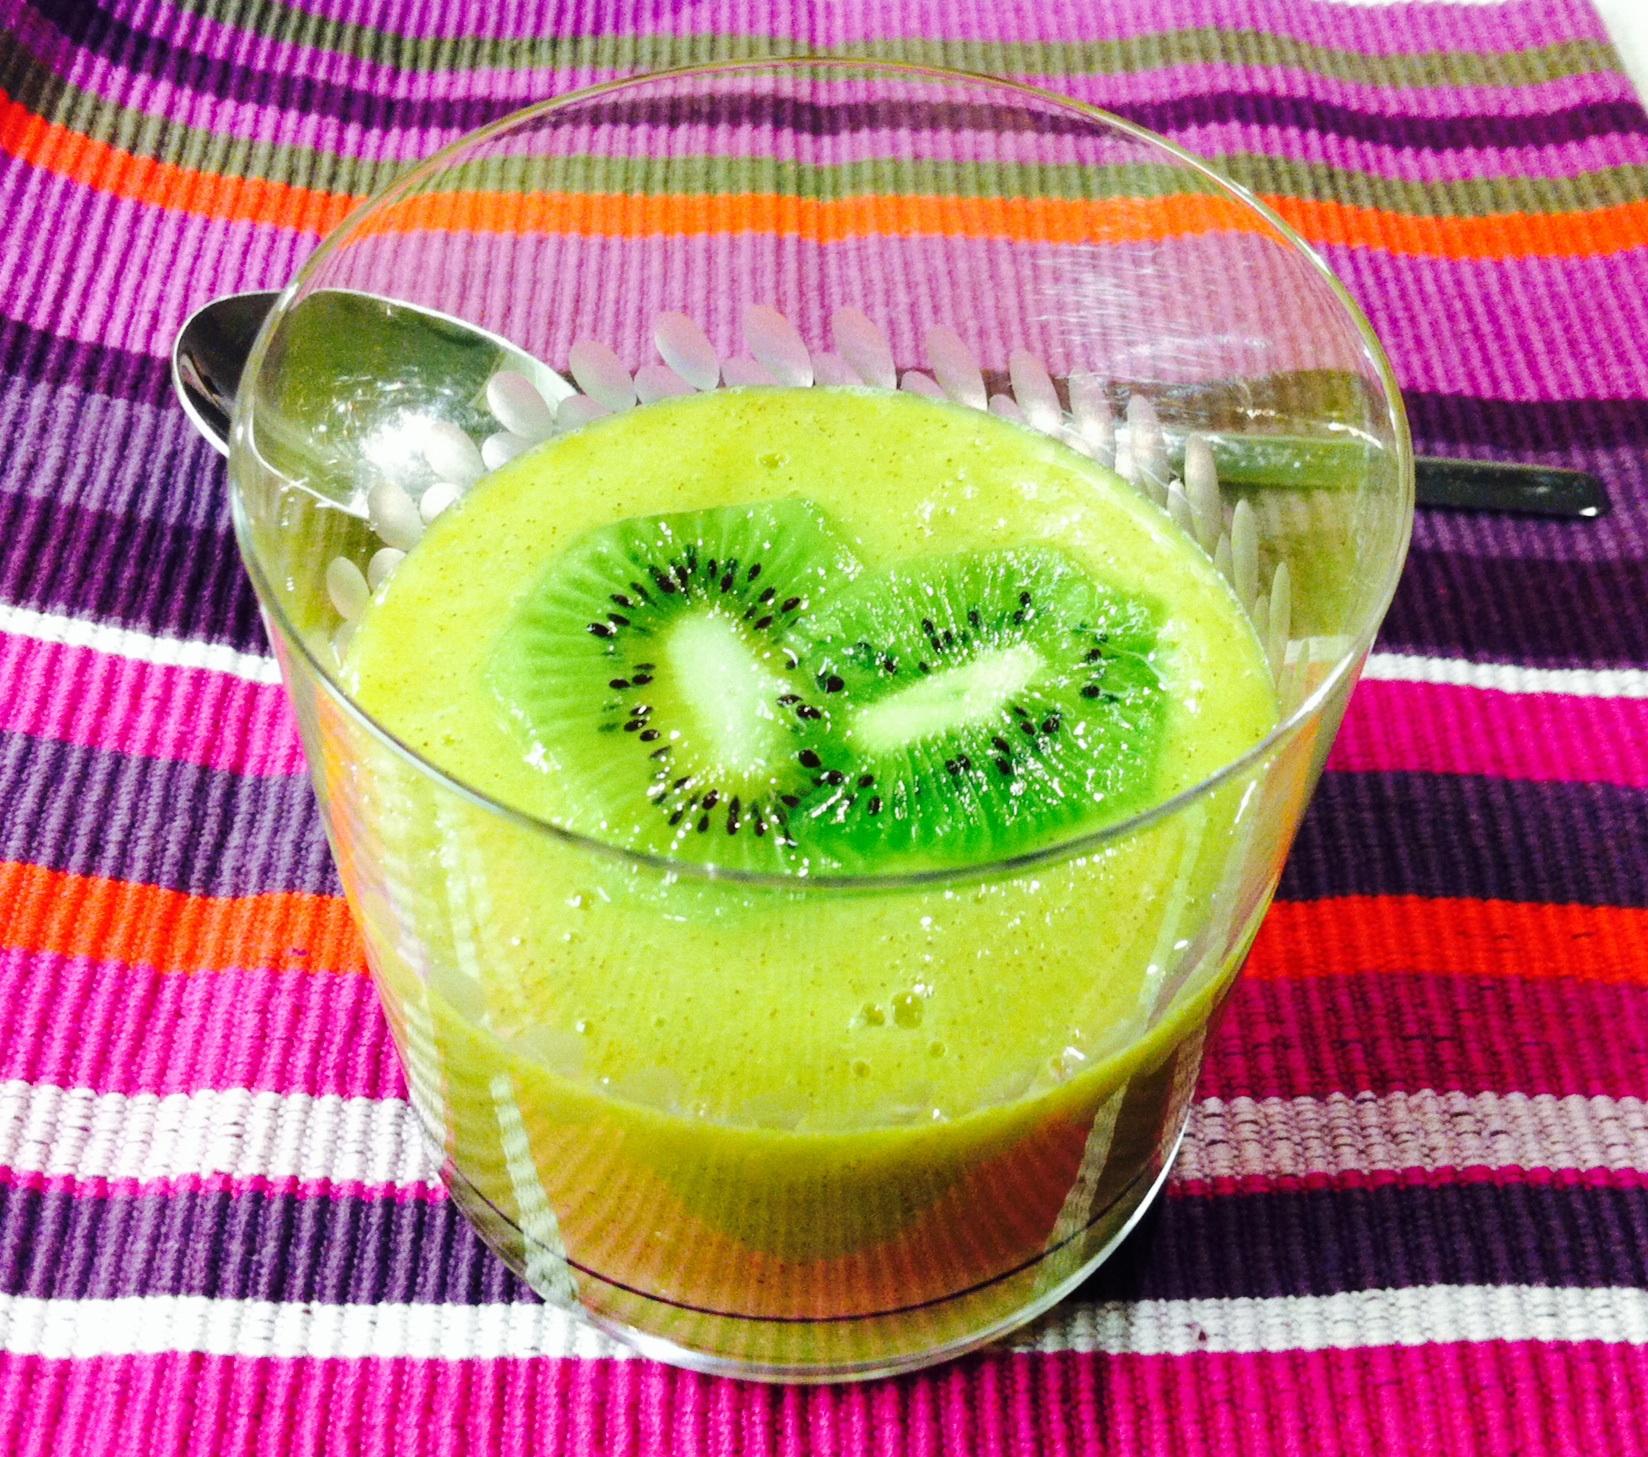 Smoothie de kiwi y jengibre